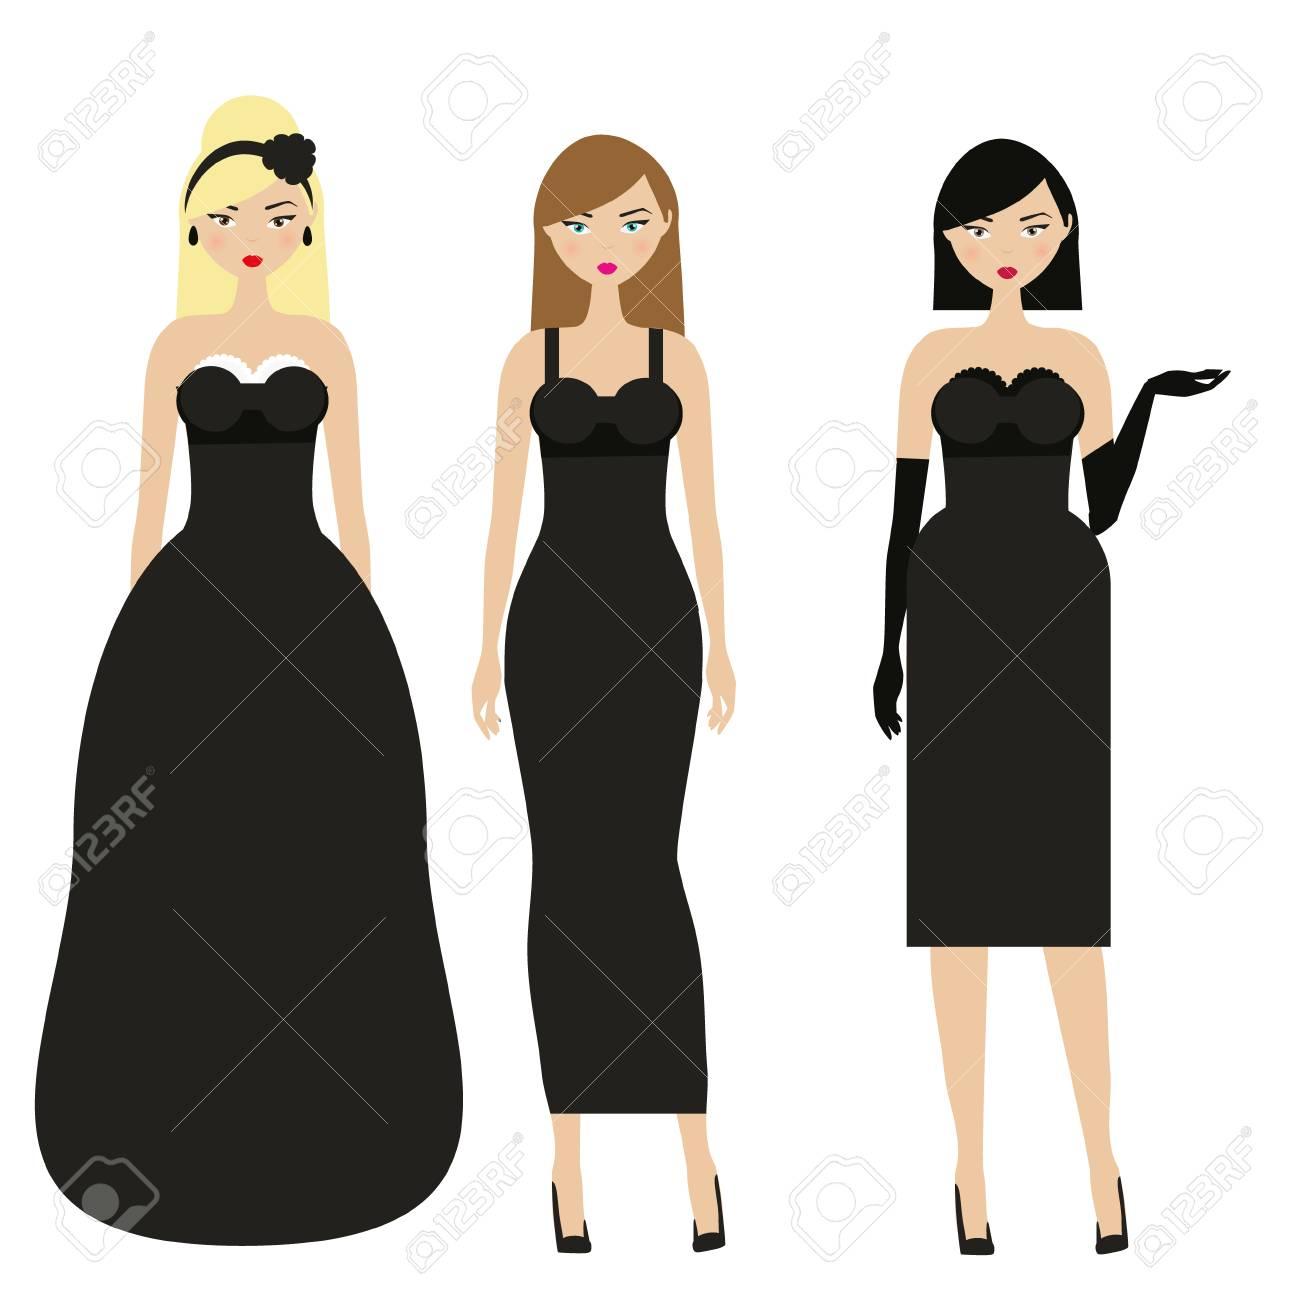 Dressy Black Clothes